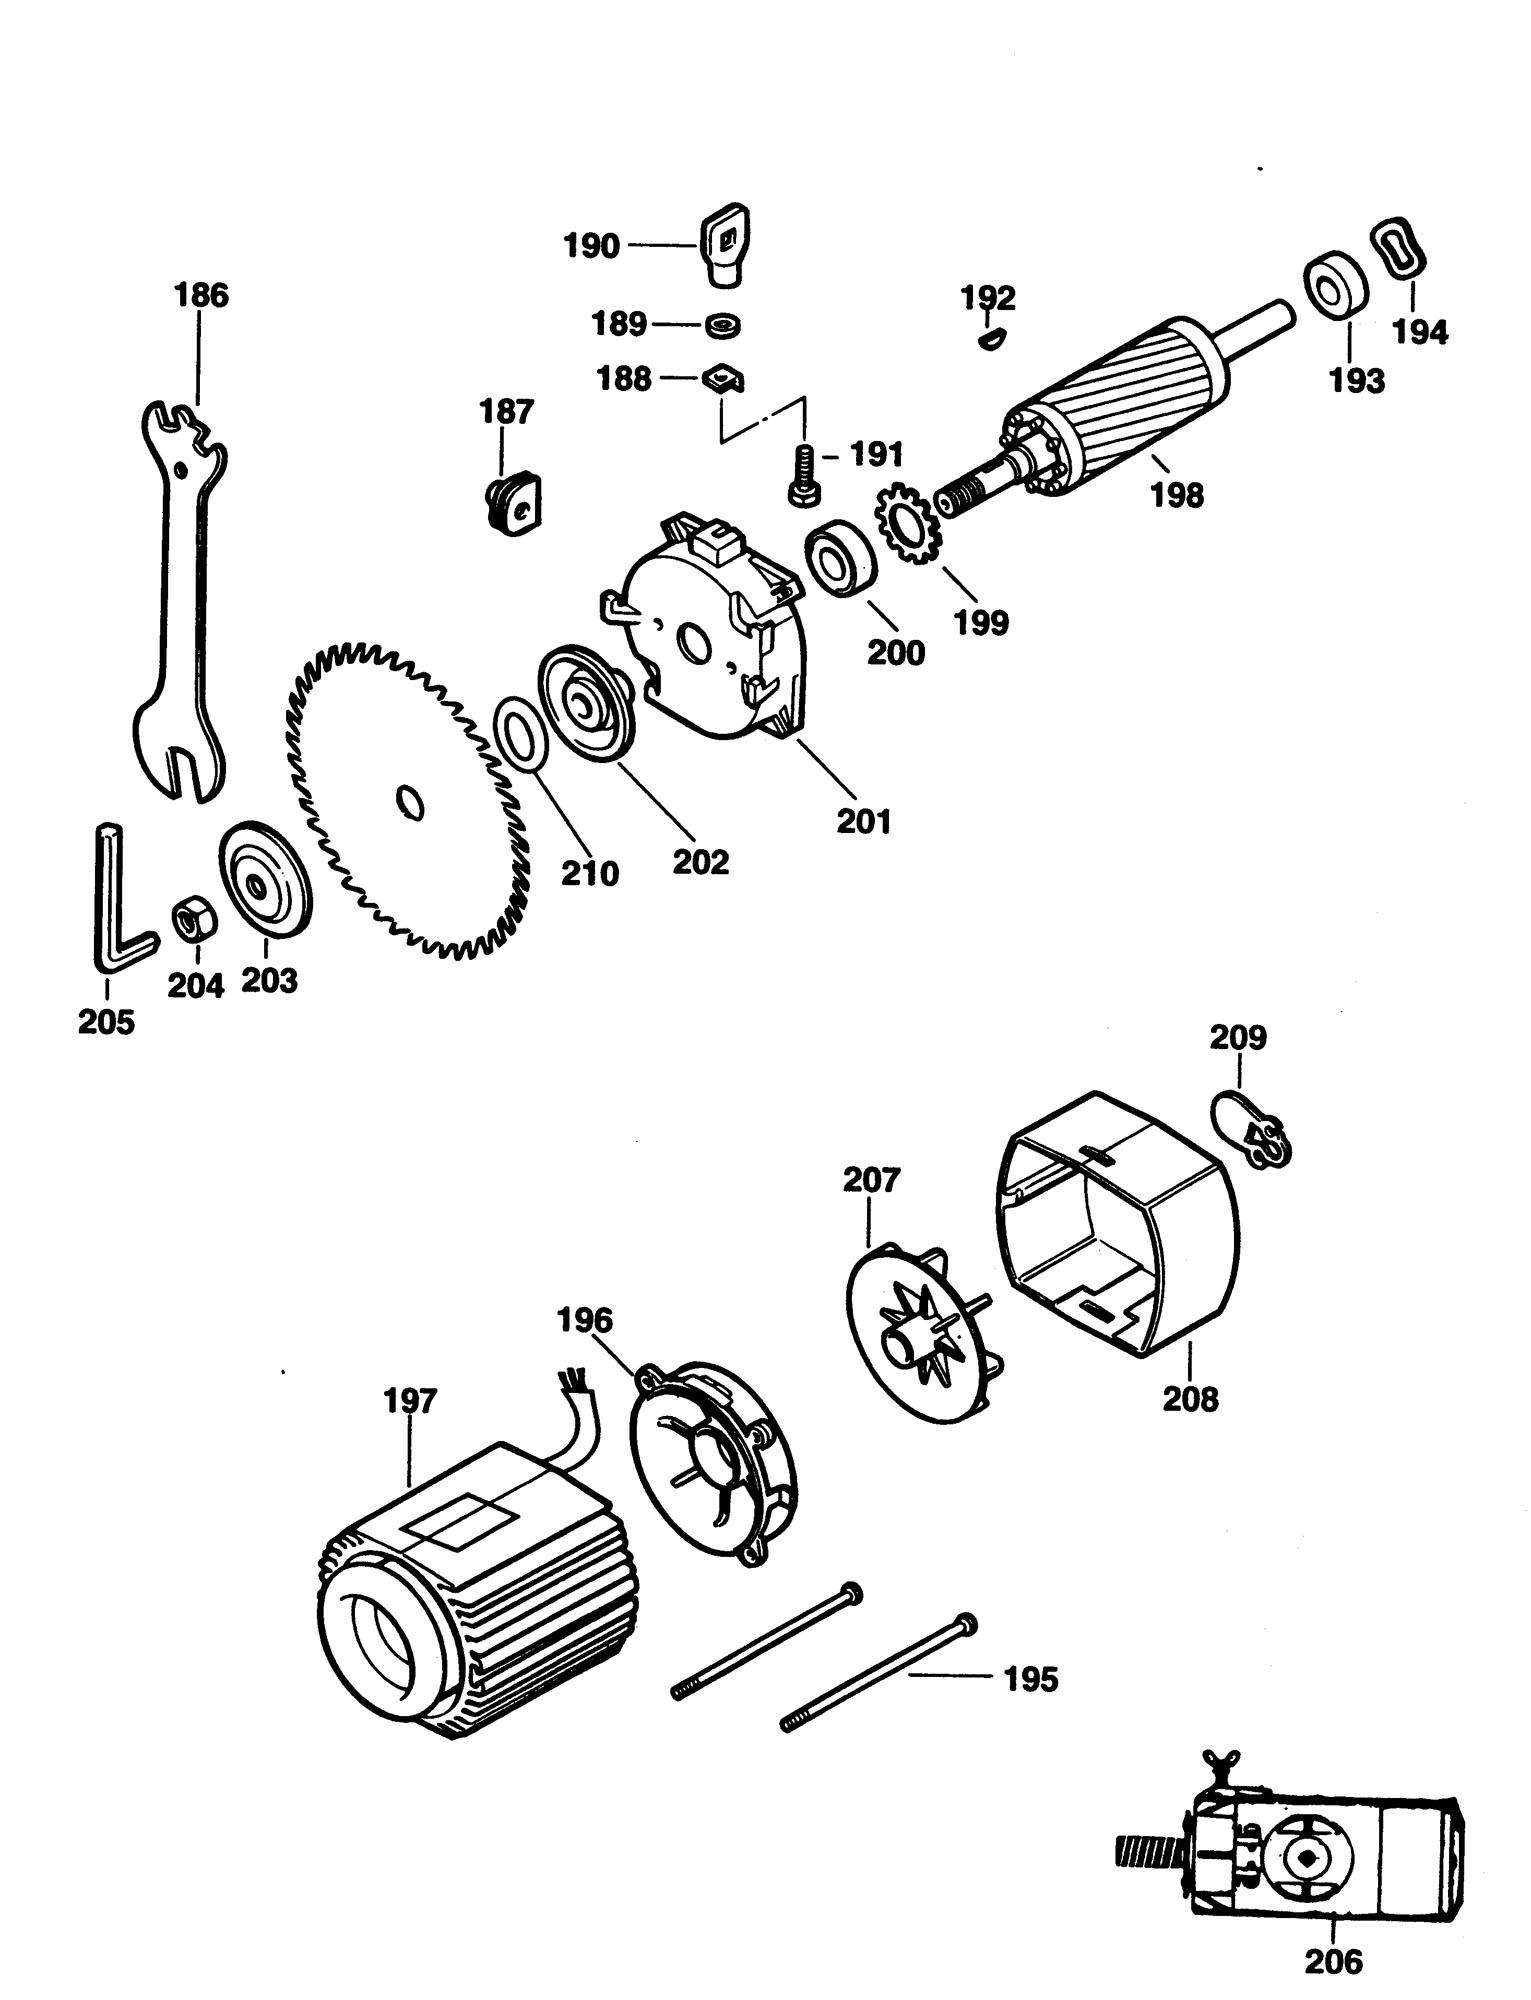 Spares For Elu Ras Radial Arm Saw Type 1ce Spare